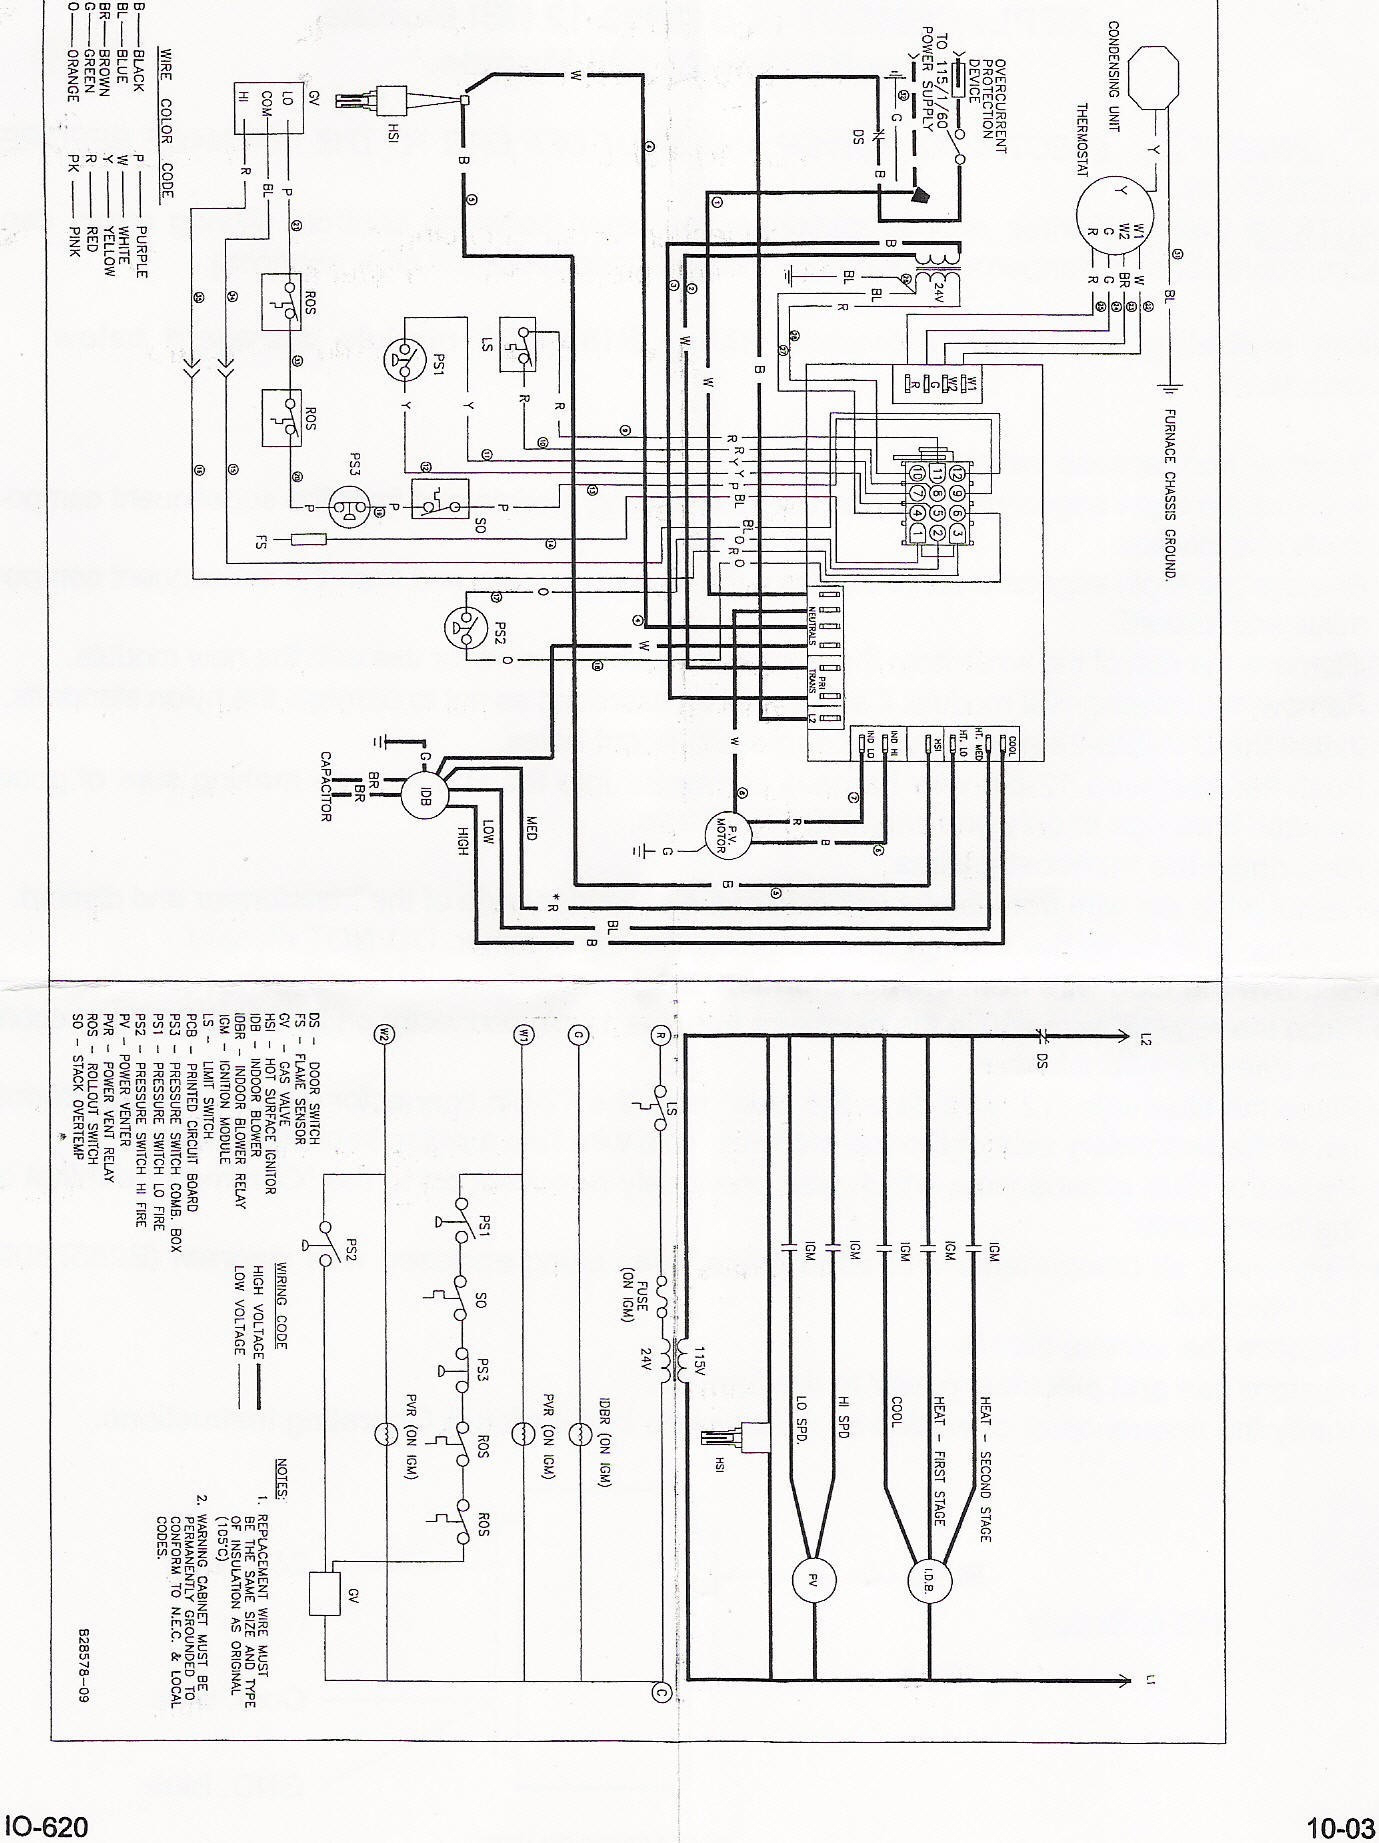 Goodman Package Unit Wiring Diagram Fresh Goodman Indoor Unit - Goodman Package Unit Wiring Diagram